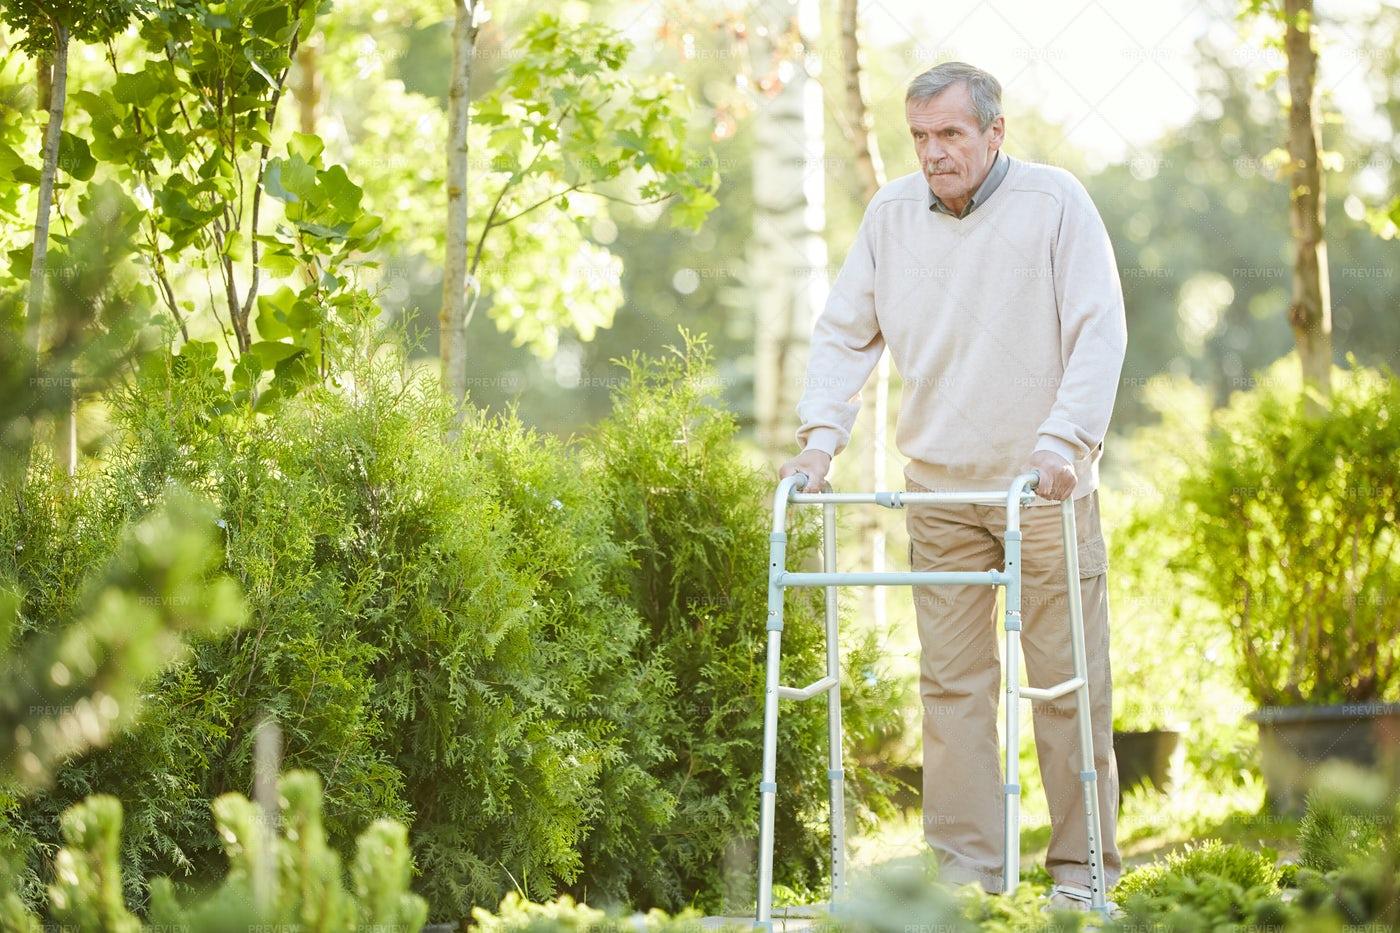 Senior Man Using Walker In Park: Stock Photos